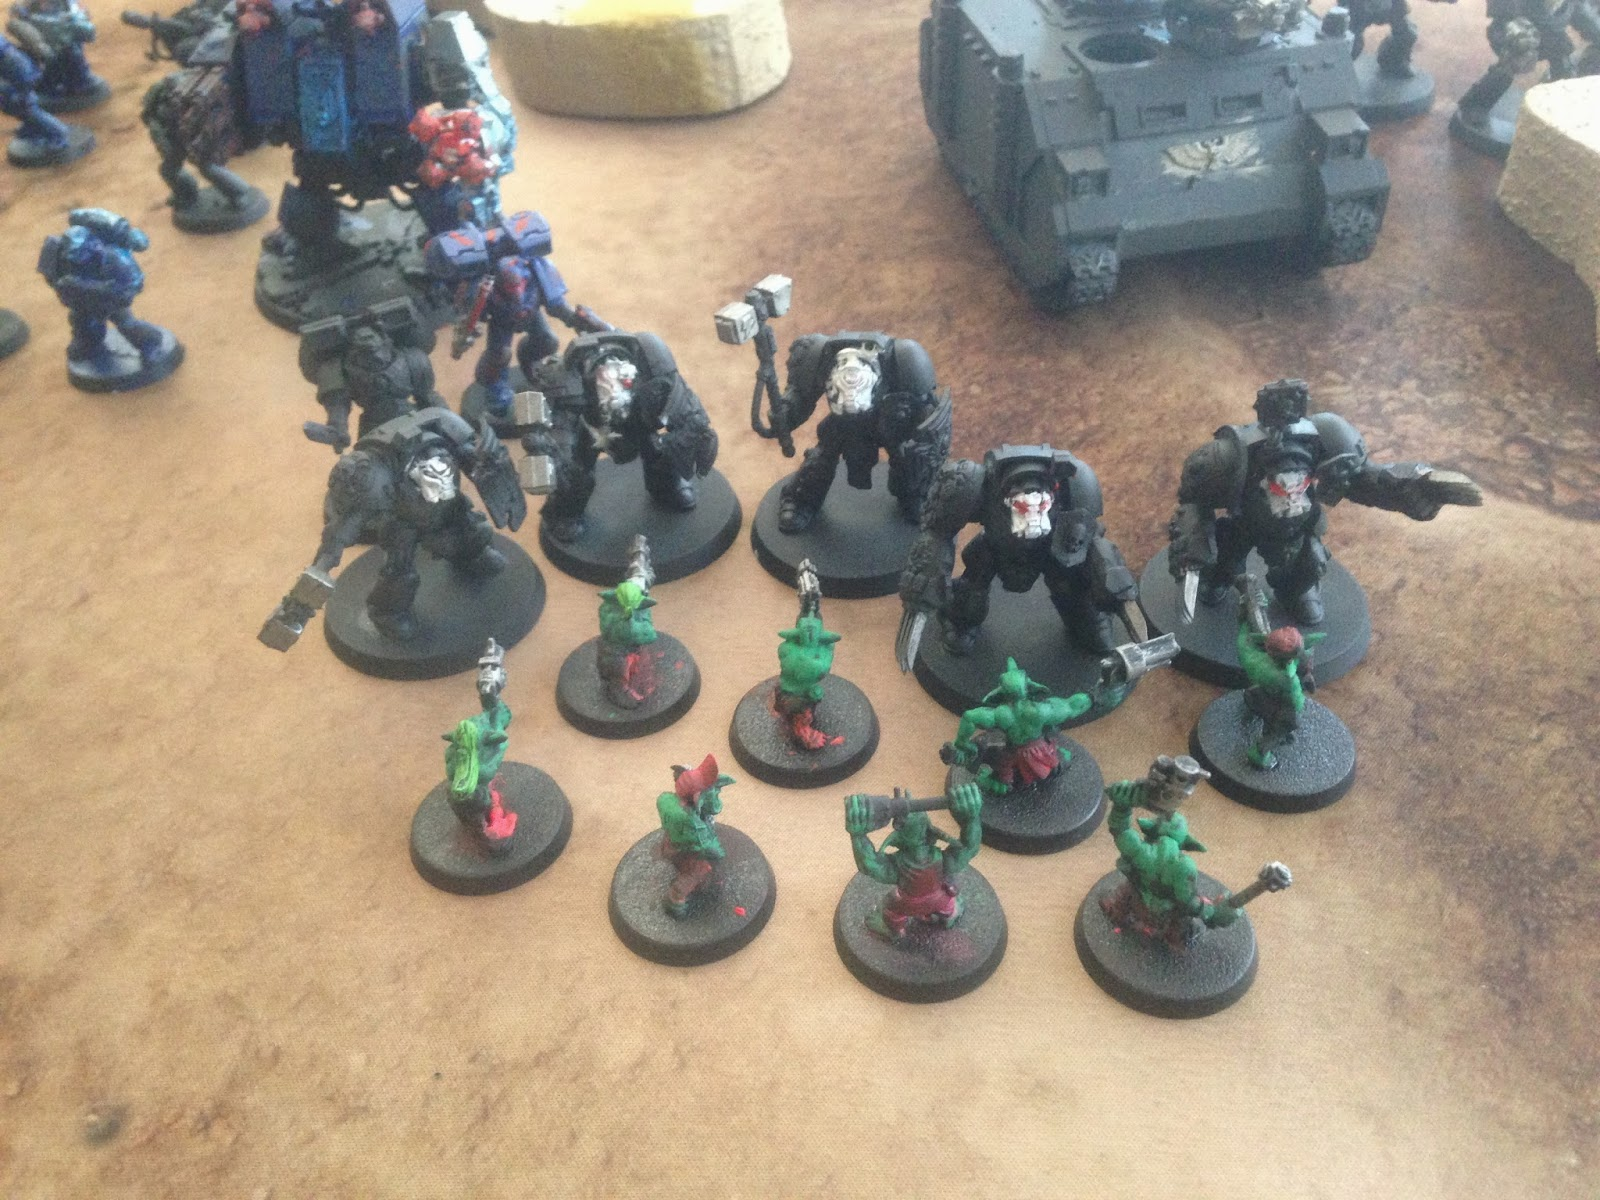 Gretchins fight Terminators, BAO 2014